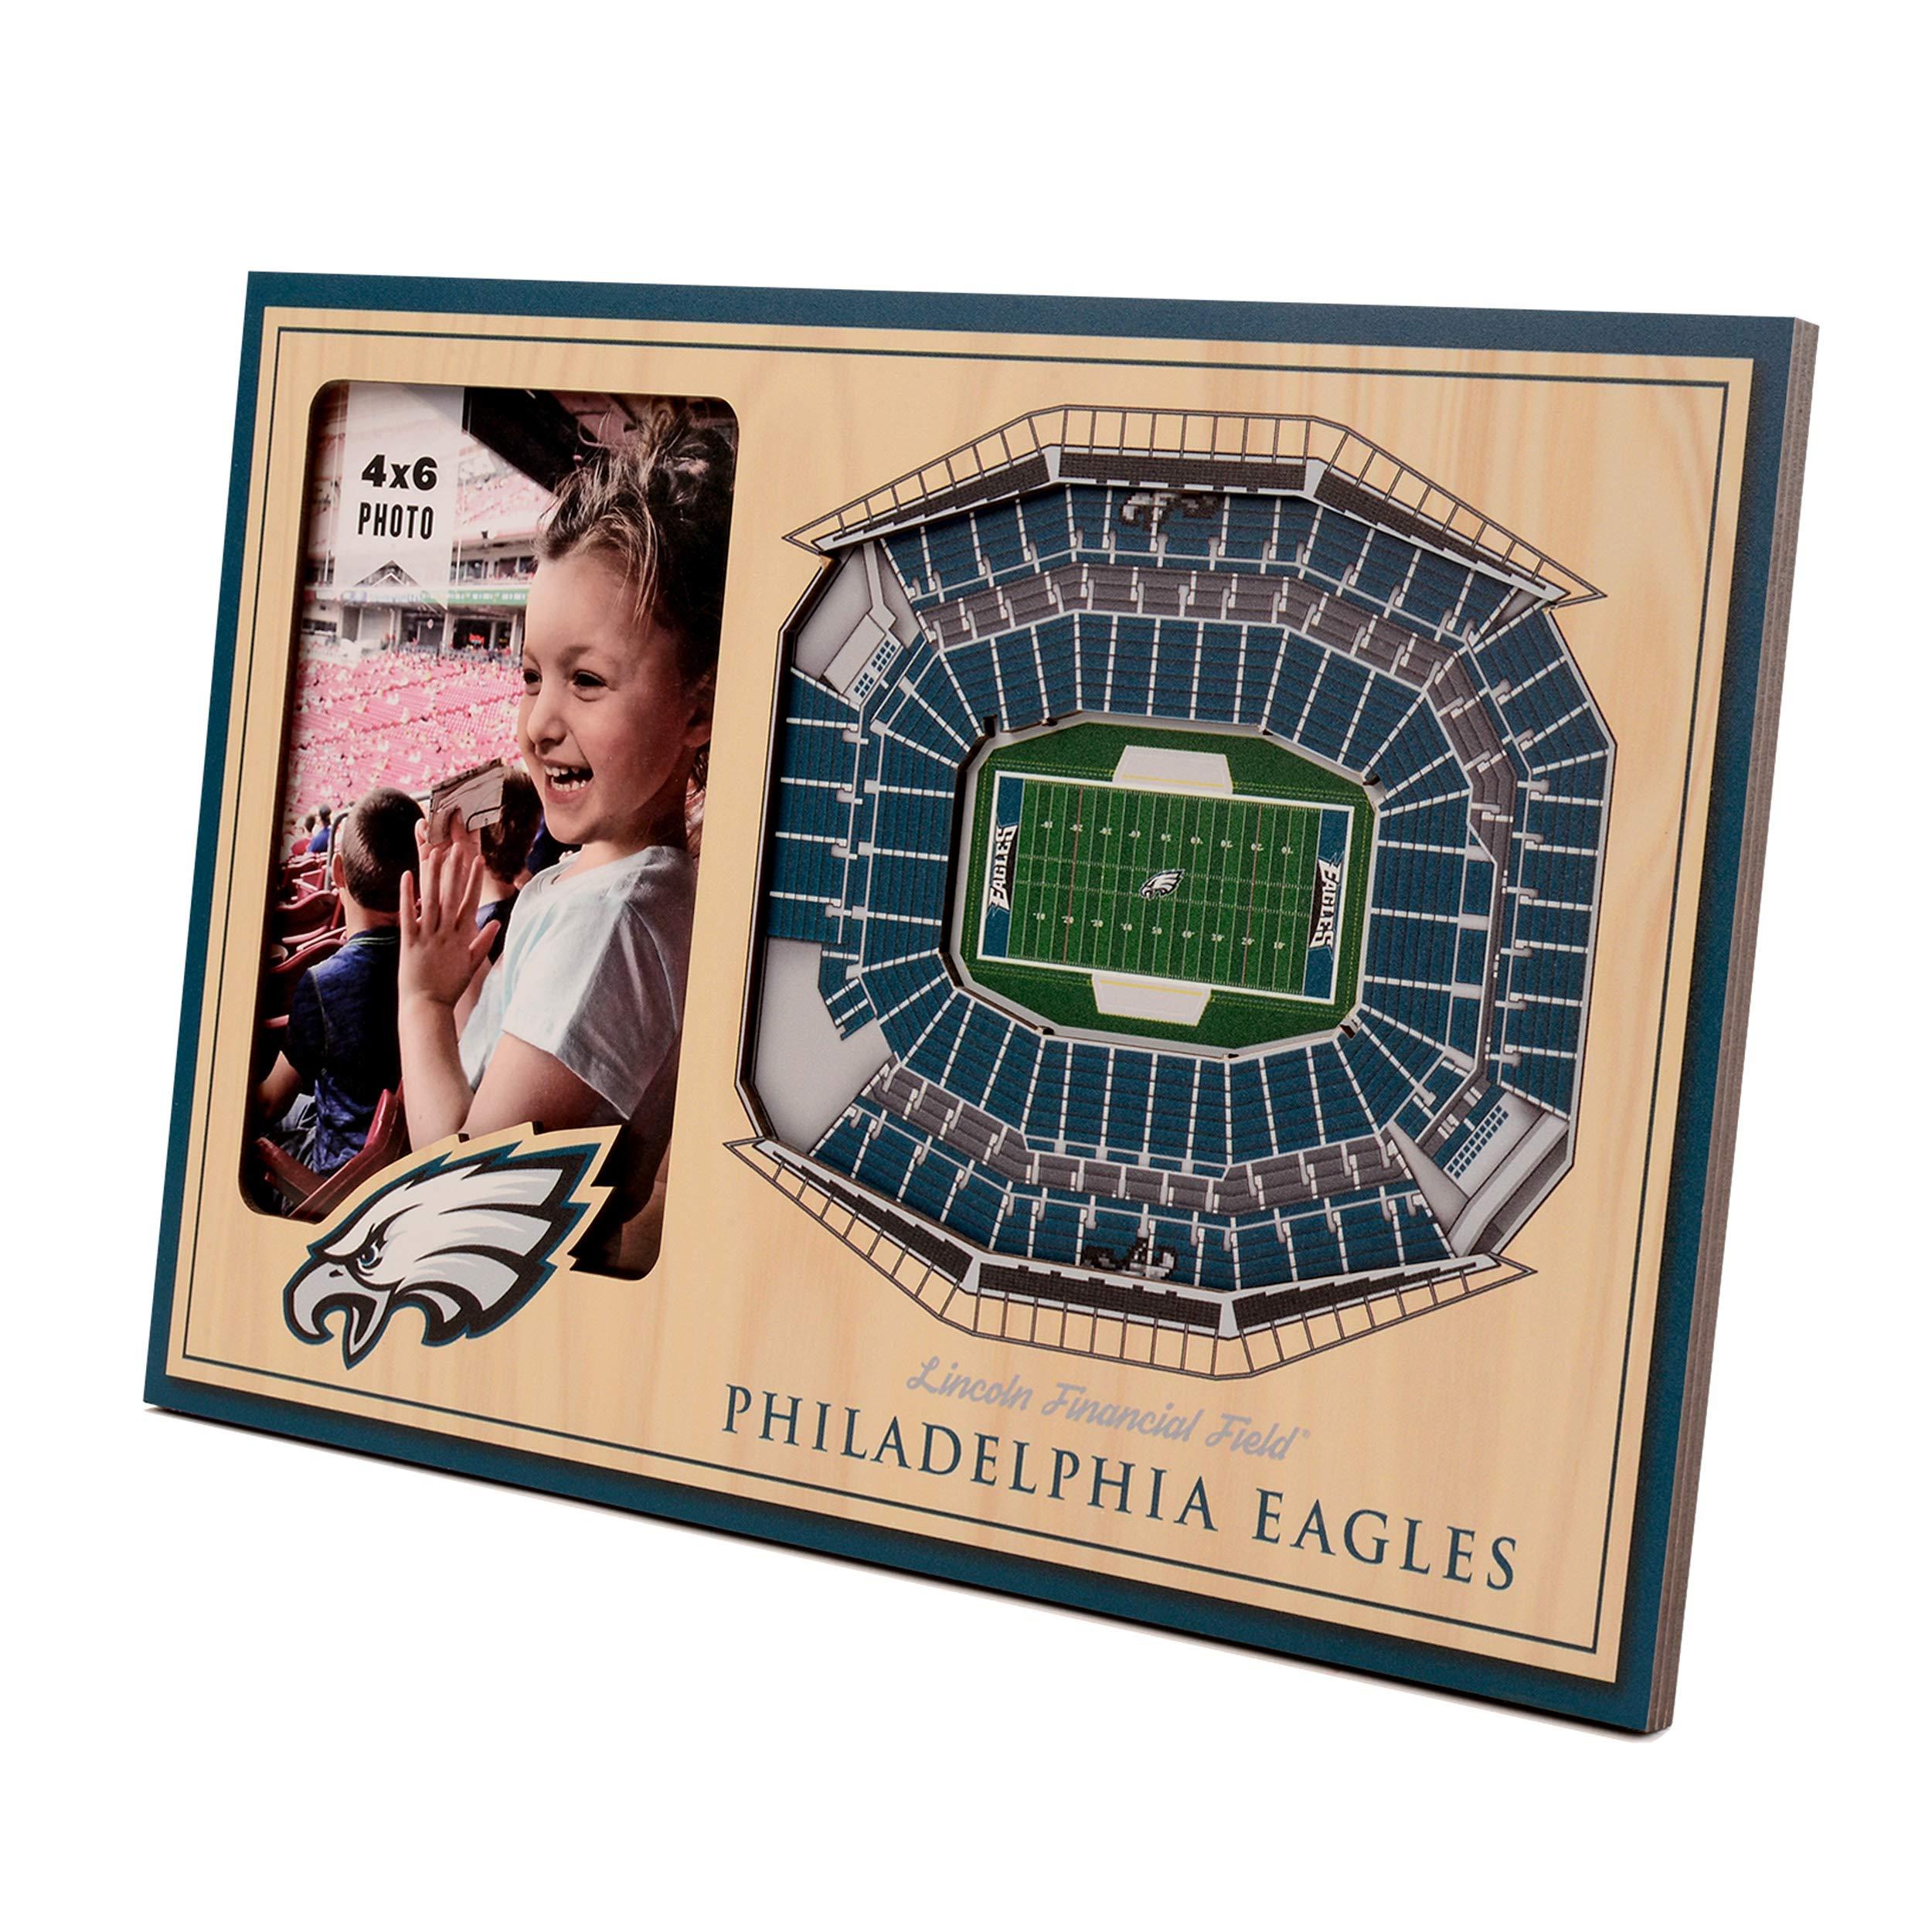 NFL Philadelphia Eagles 3D StadiumViews Picture Frame by YouTheFan